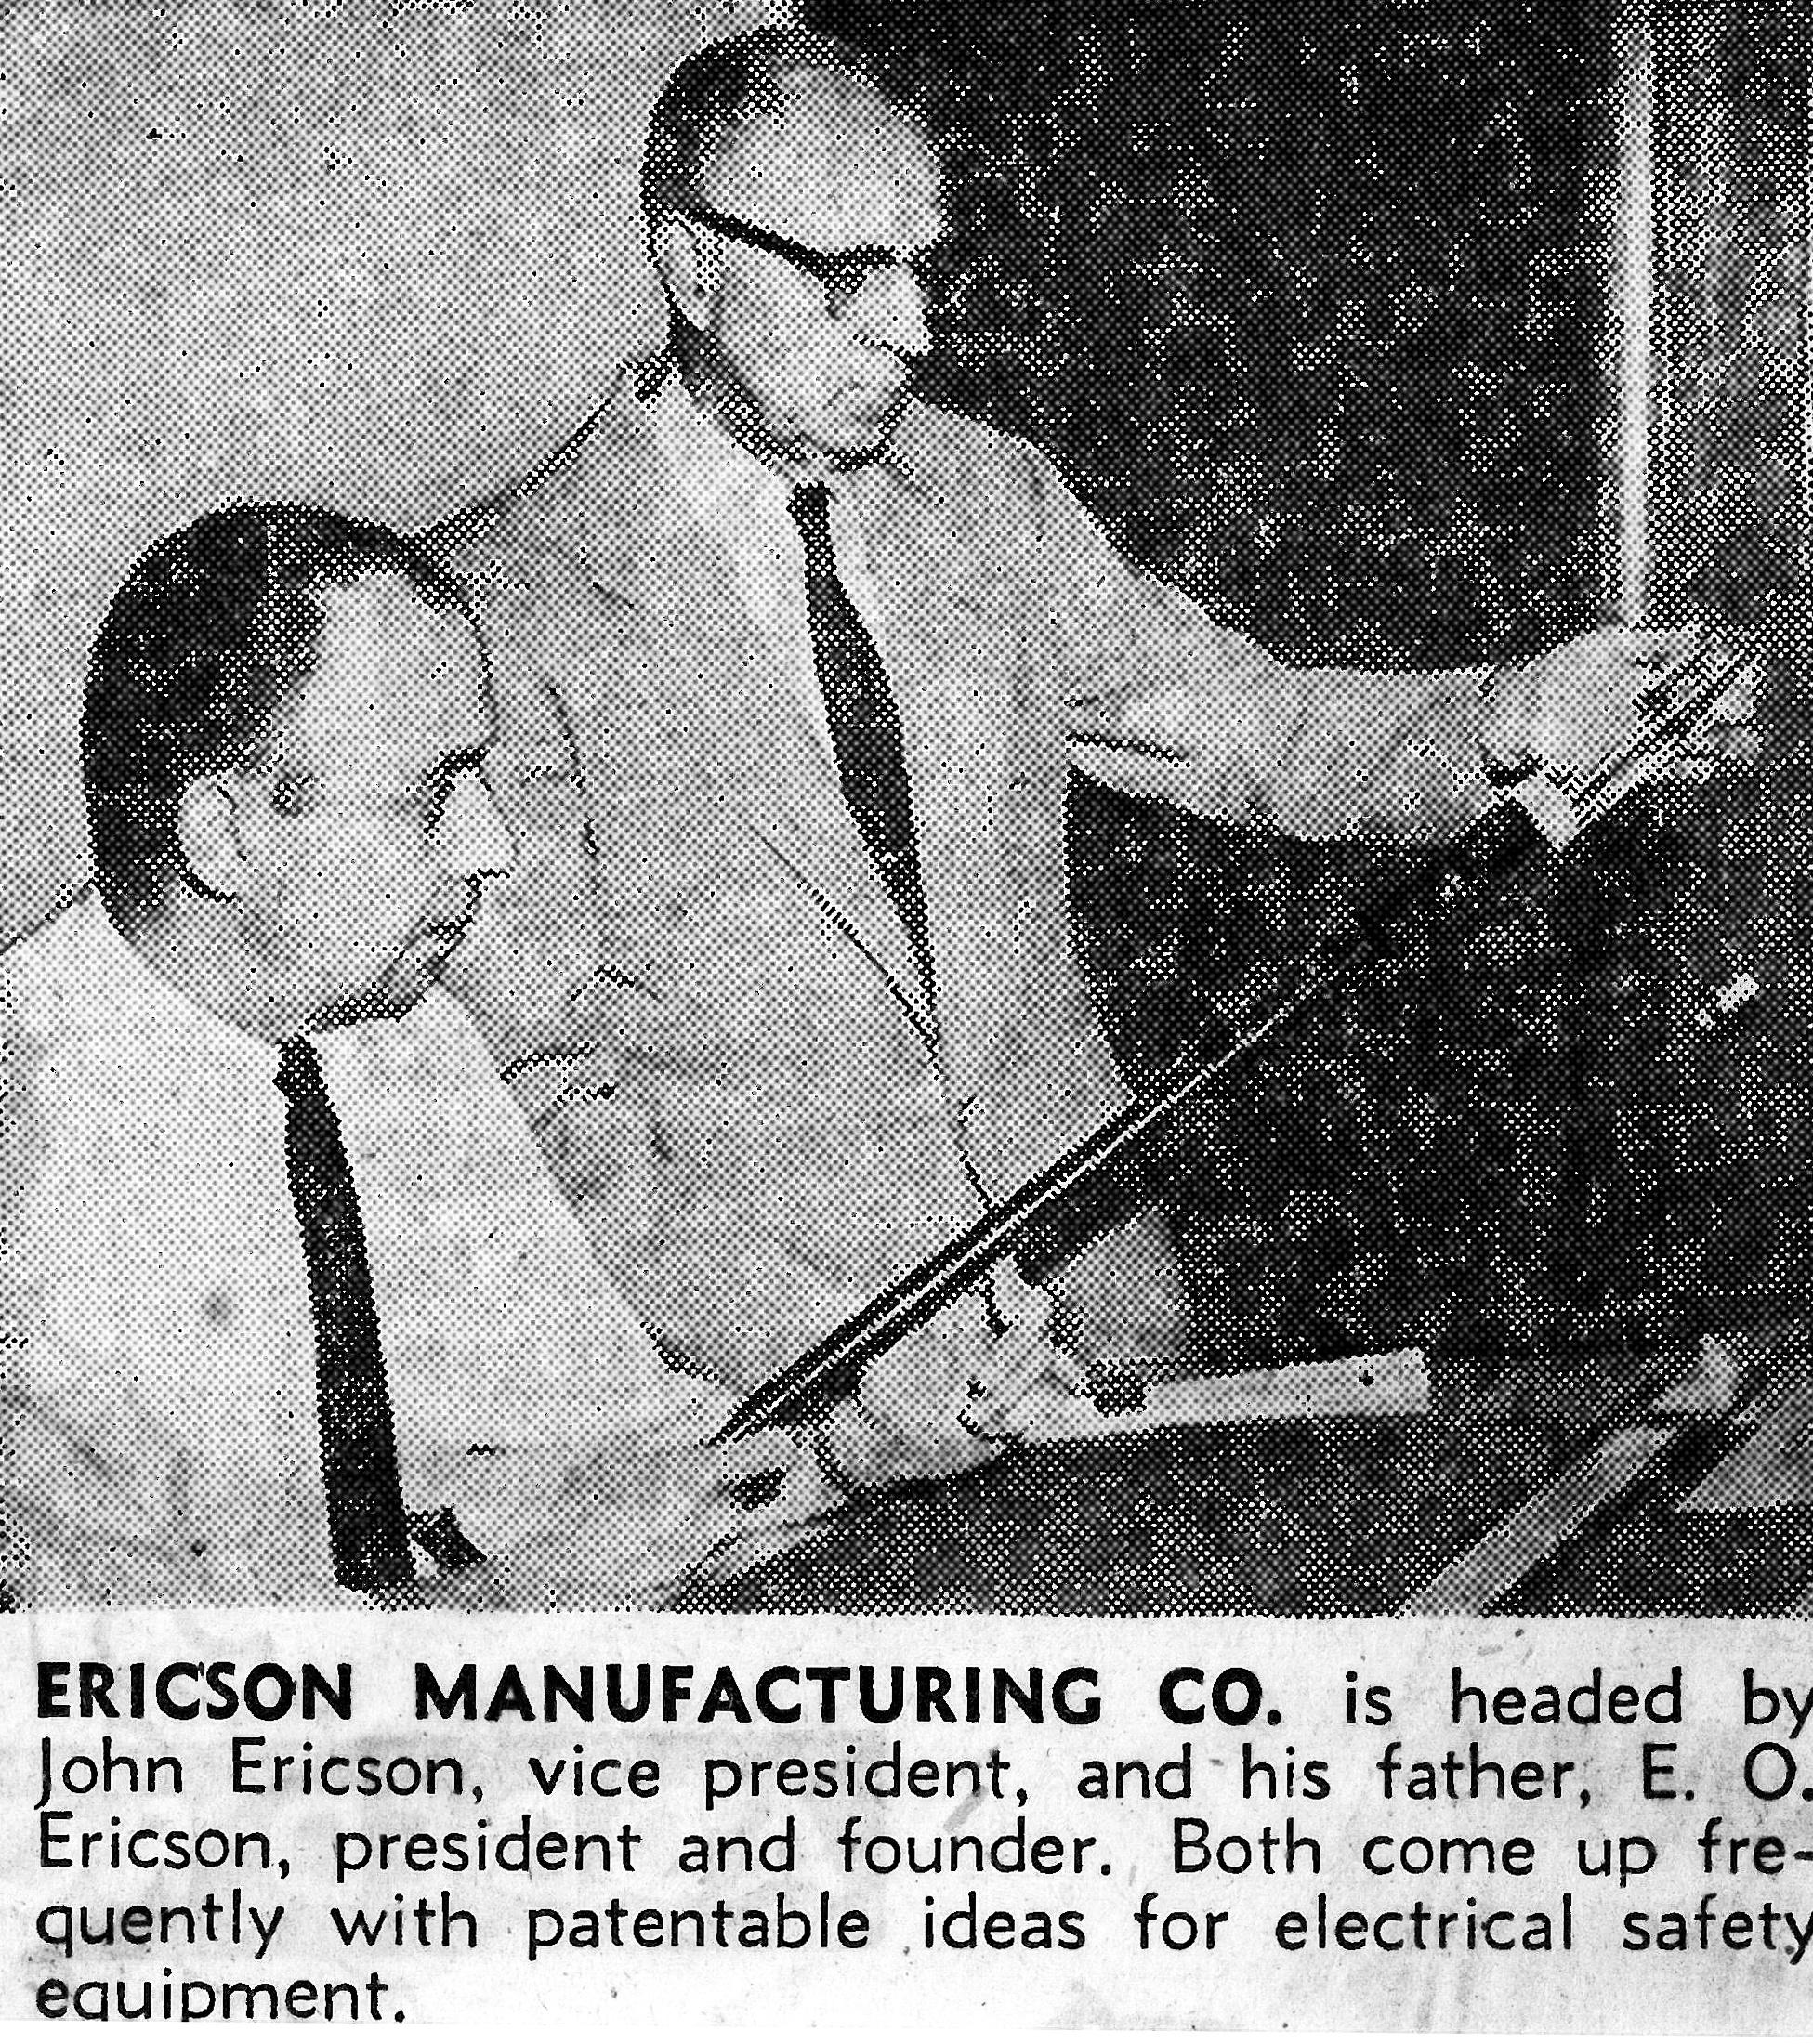 E. O. Ericson & John Ericson Sr